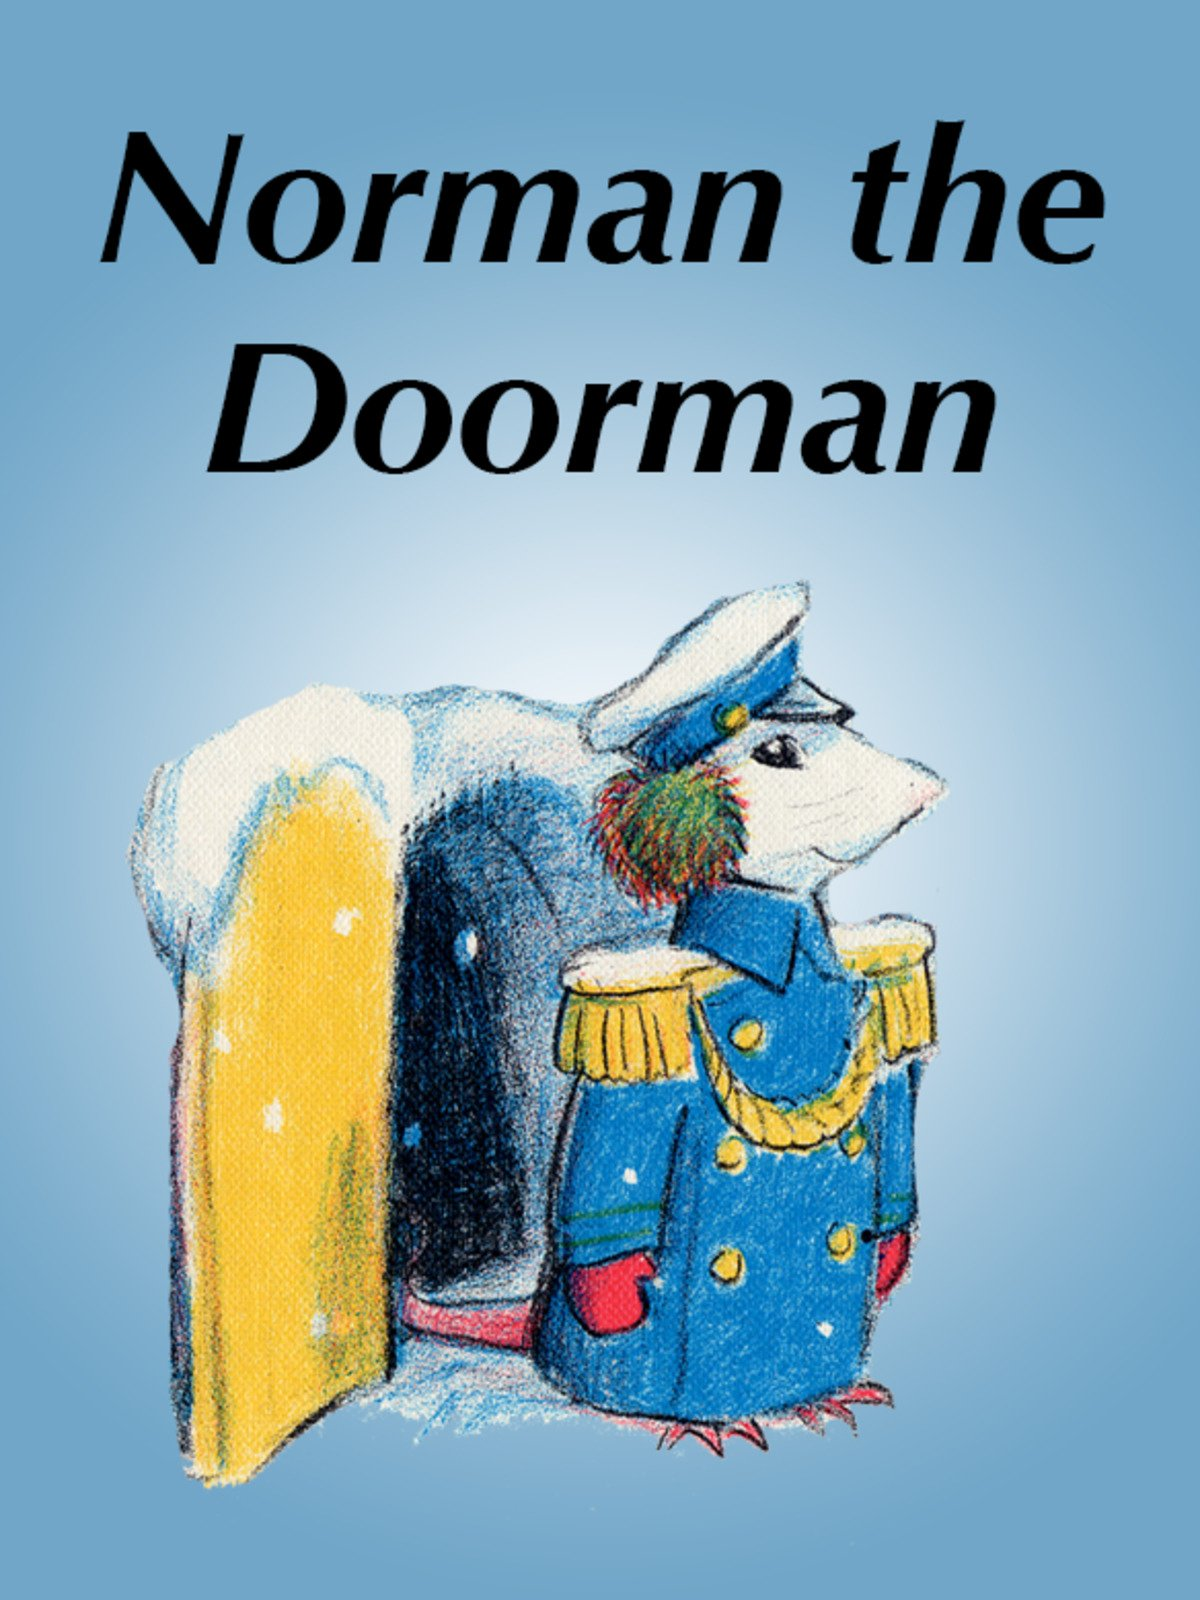 Norman the Doorman on Amazon Prime Instant Video UK